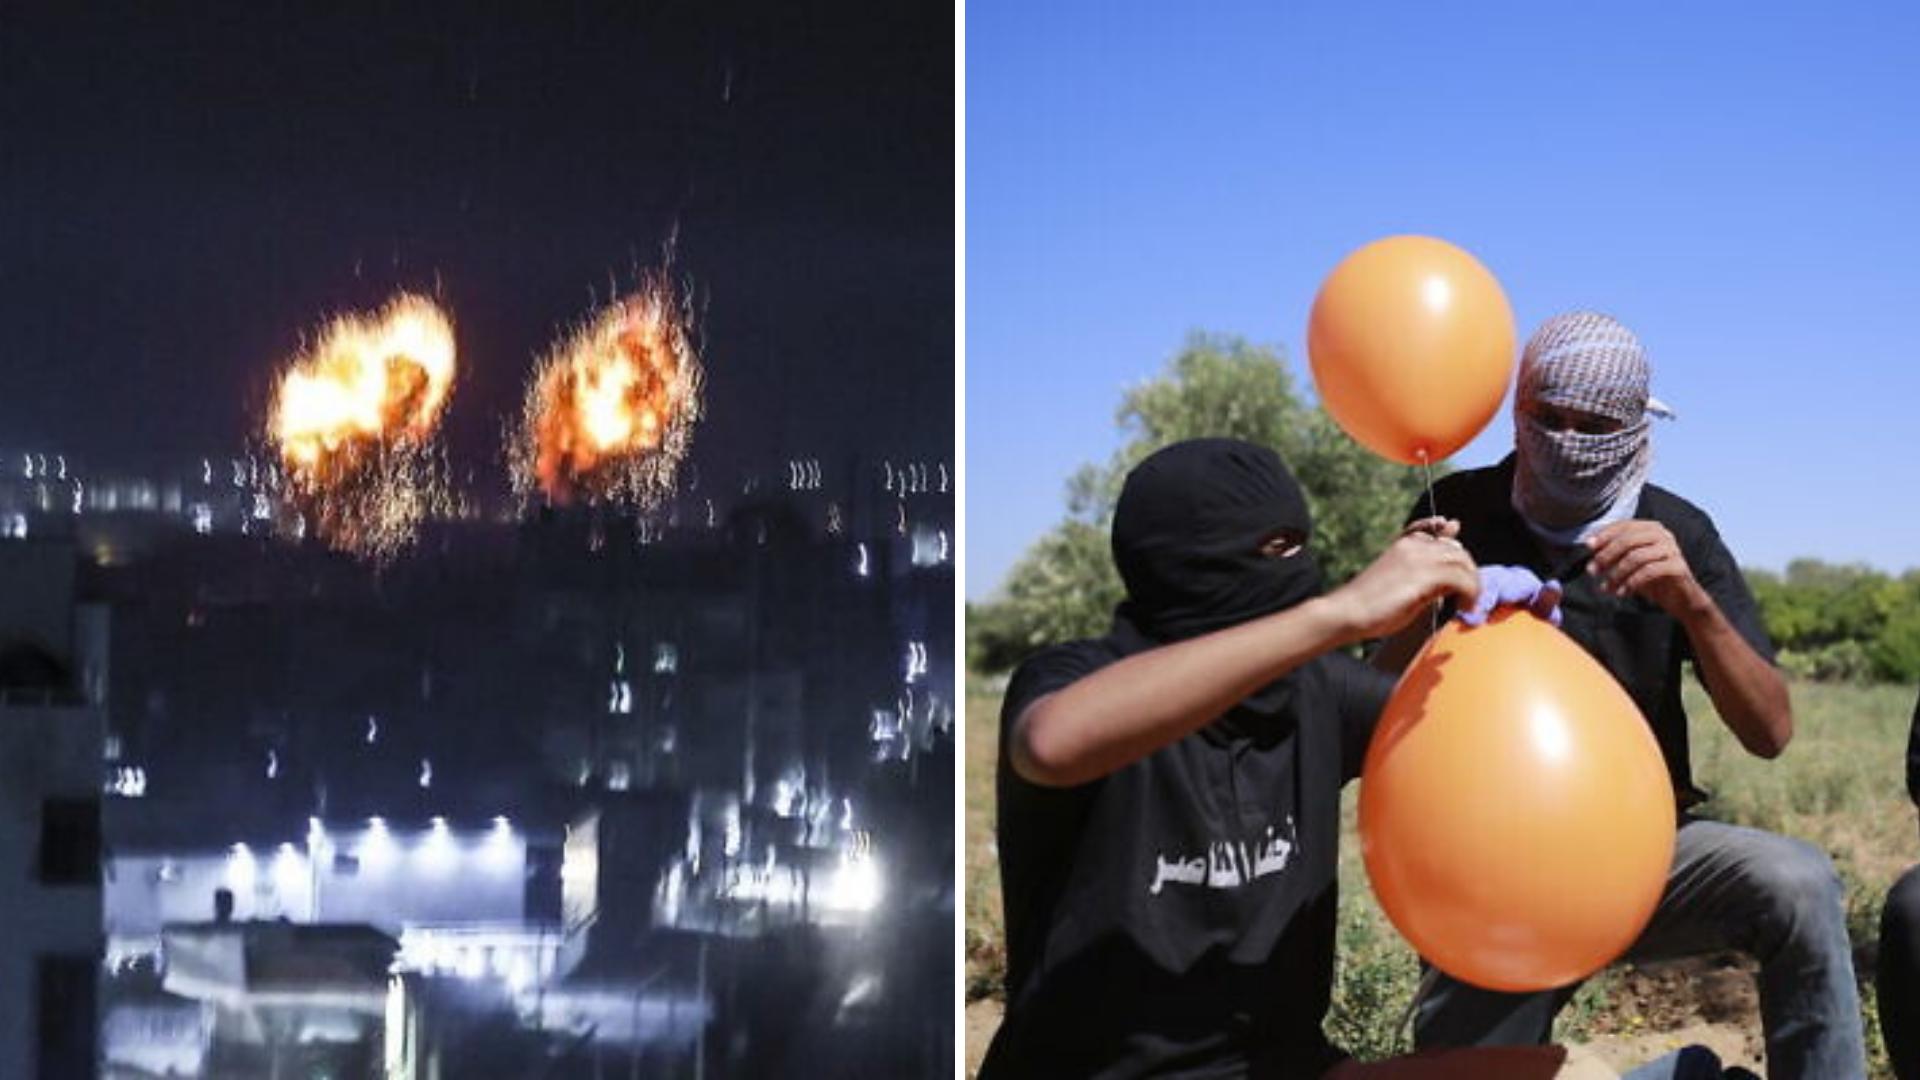 Israel volta a reagir contra ataques do Hamas ao território judeu